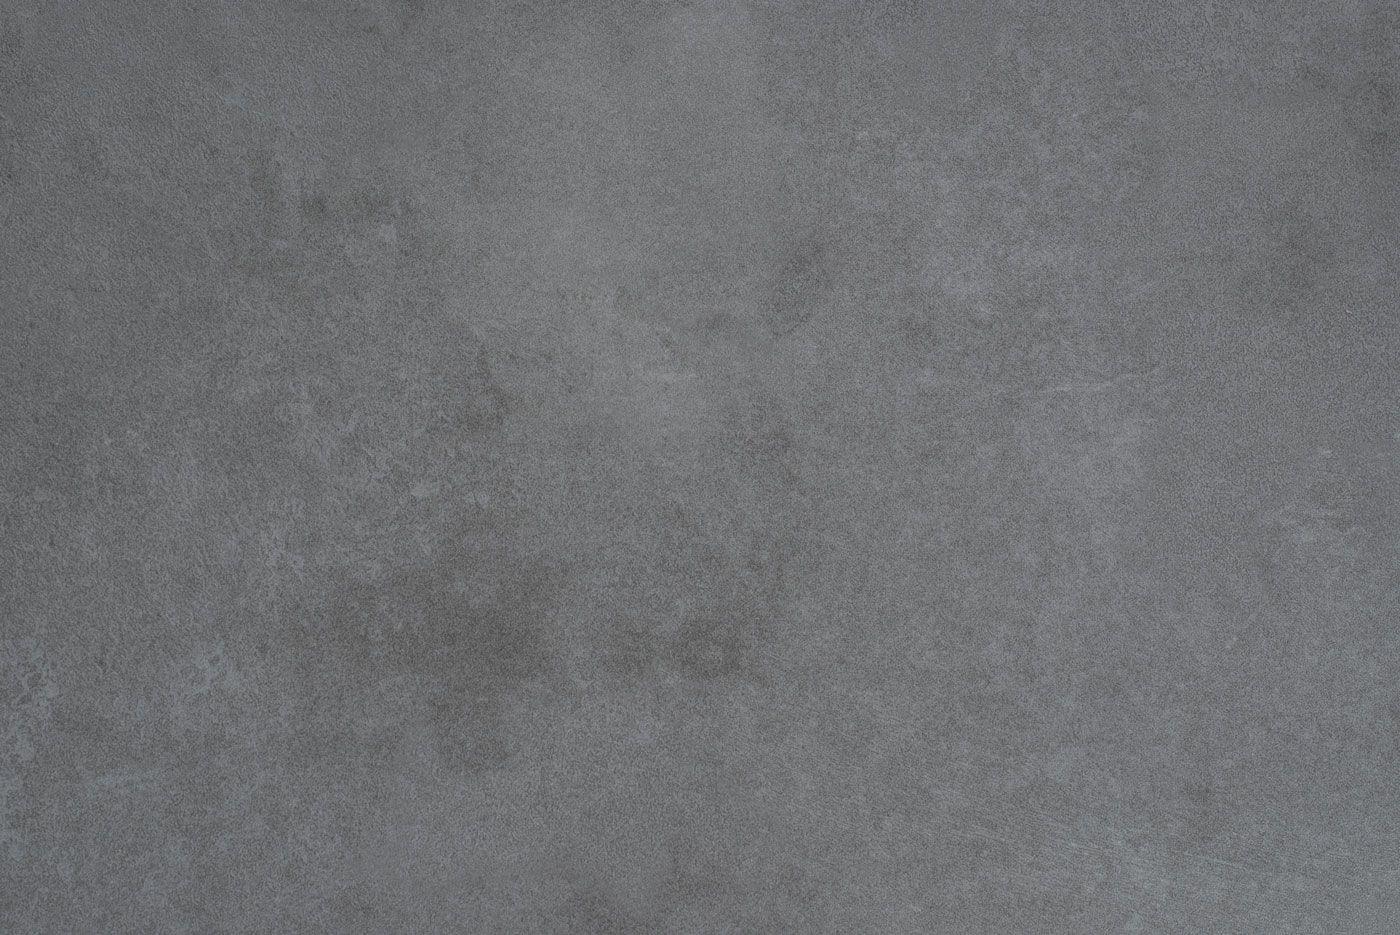 Floer tegel pvc vloeren natuursteen matgrijs